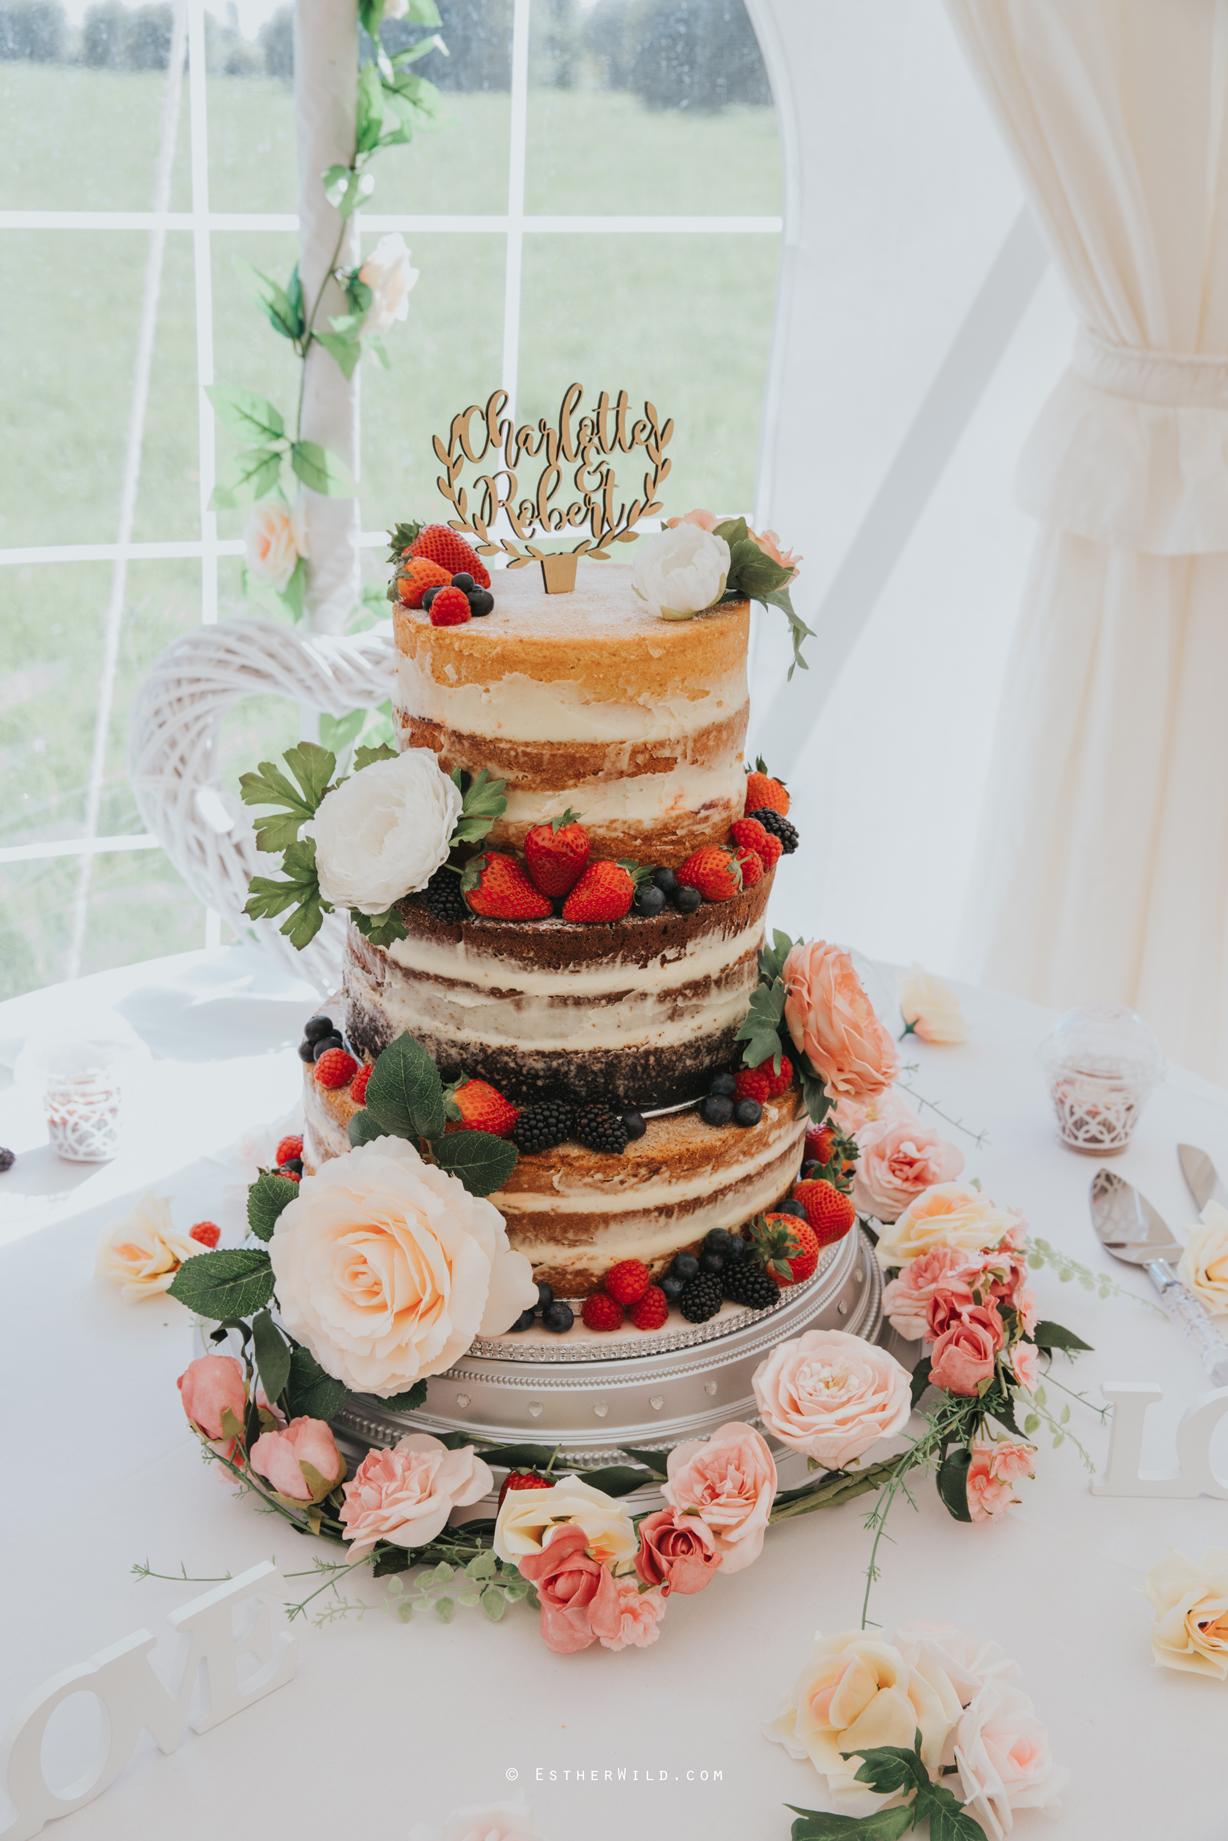 IMG_1066Walpole_St_Andrew_Church_Norfolk_Wedding_Copyright_Esther_Wild_Photographer_.jpg